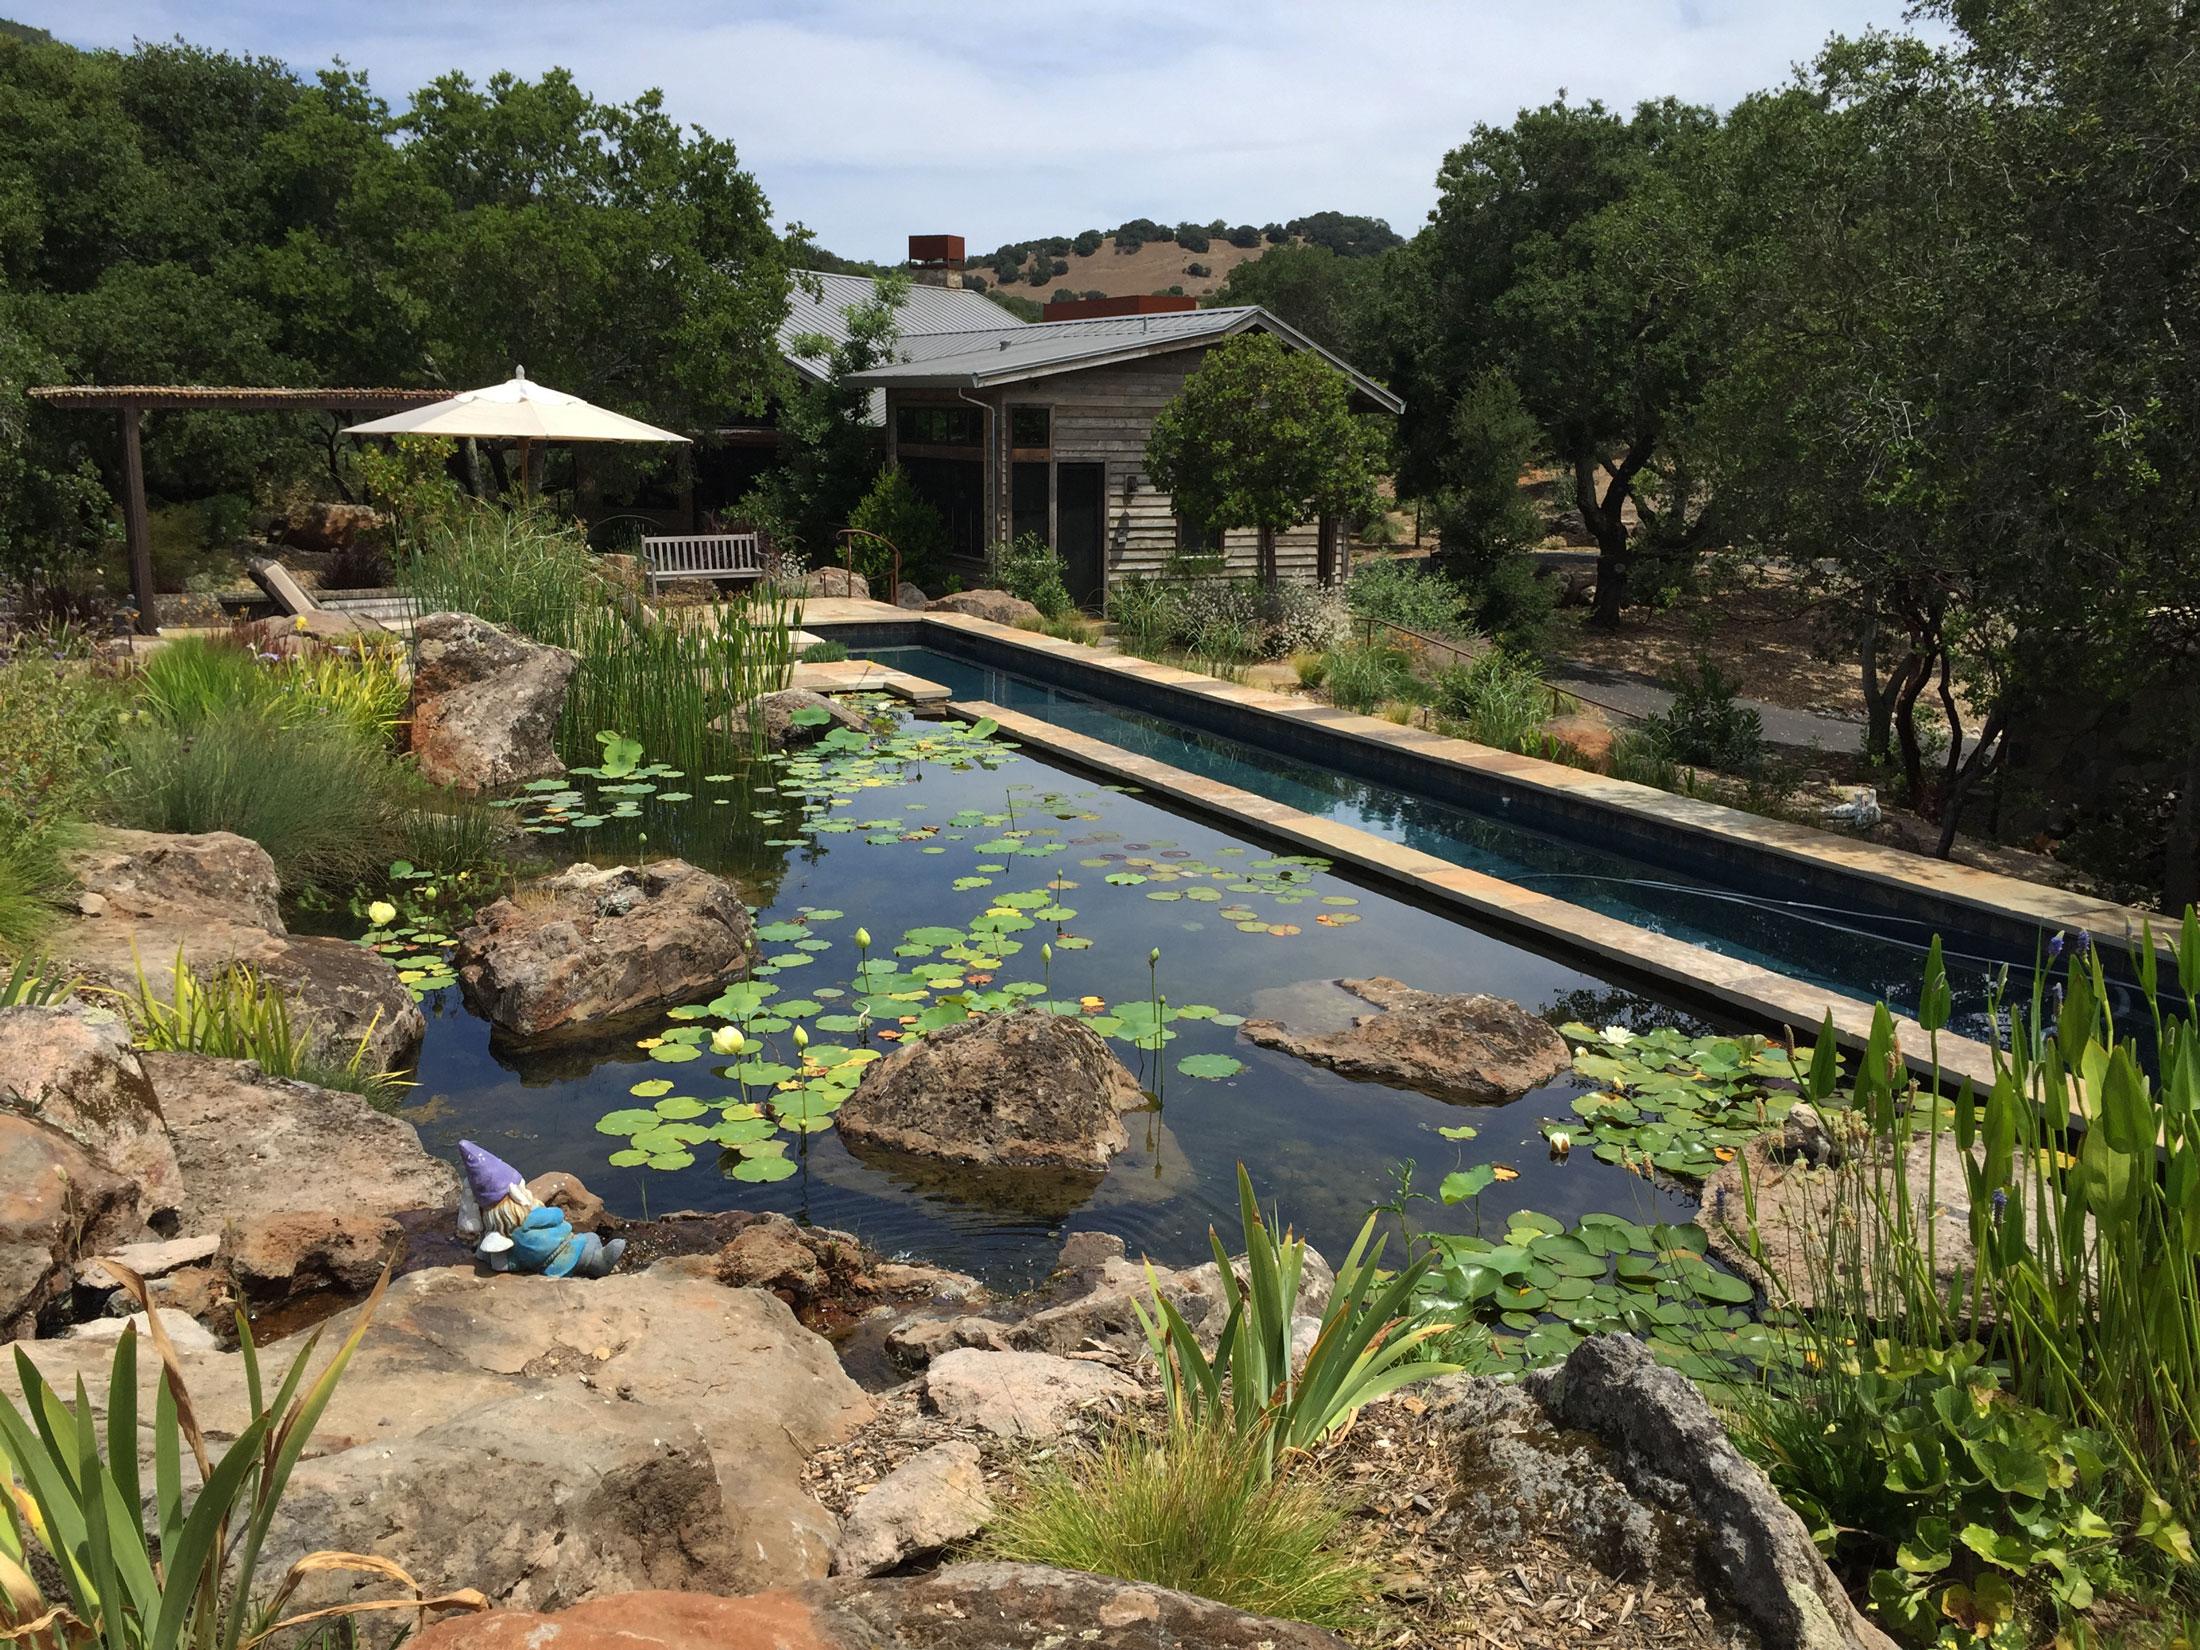 Forget backyard pools build a swimming pond instead for Koi zone pond aquatics